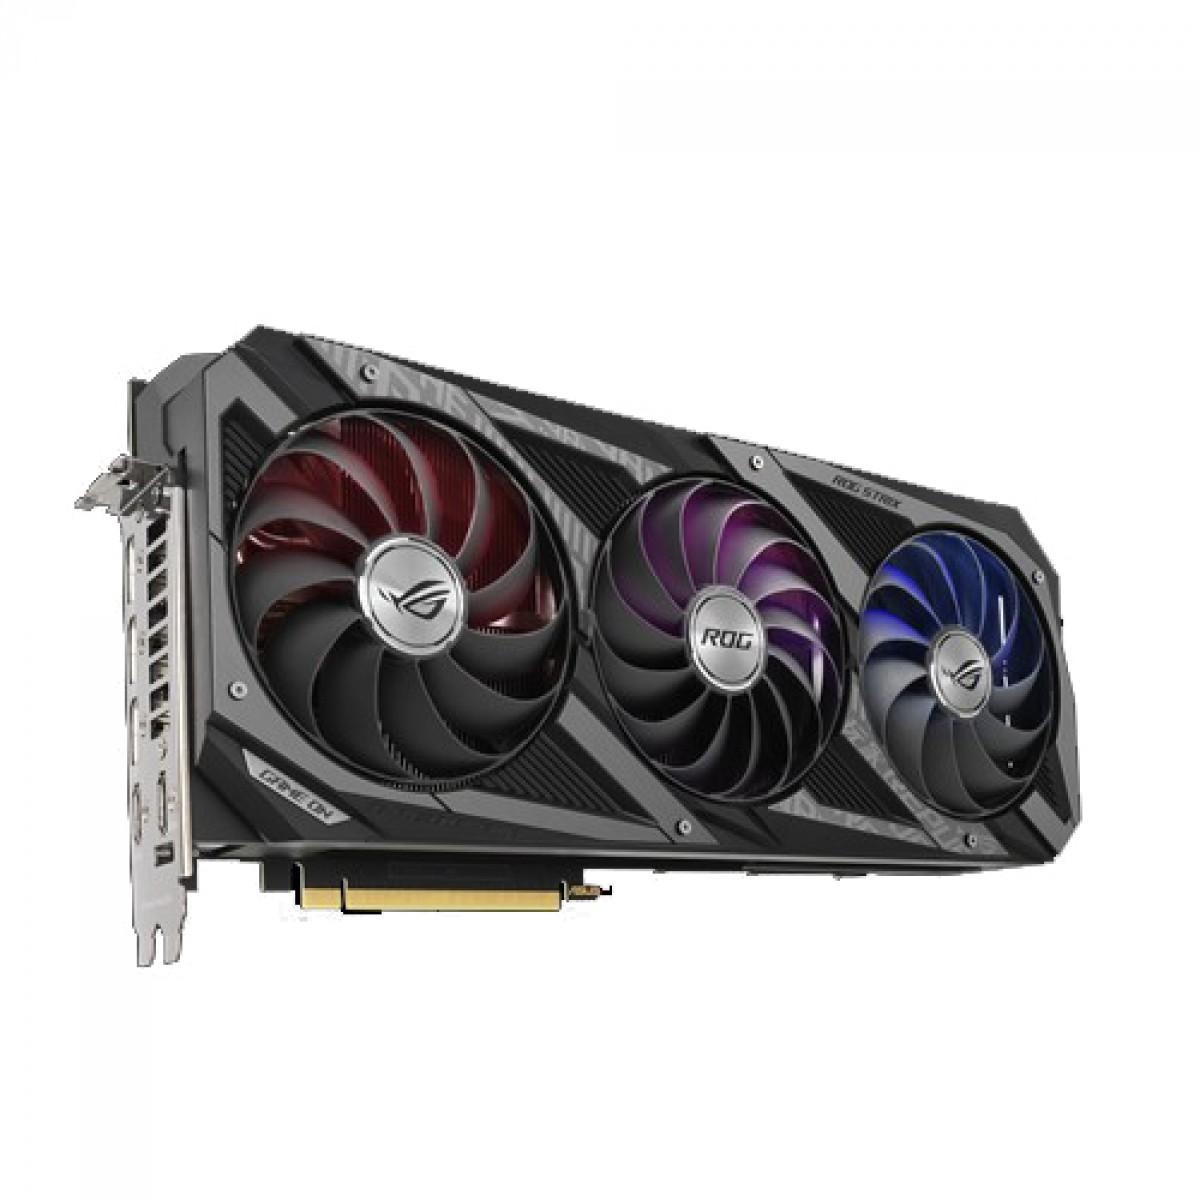 Placa de Vídeo Asus ROG Strix Geforce, RTX 3080, 10GB, GDDR6X, 320bit, ROG-STRIX-RTX3080-10G-GAMING